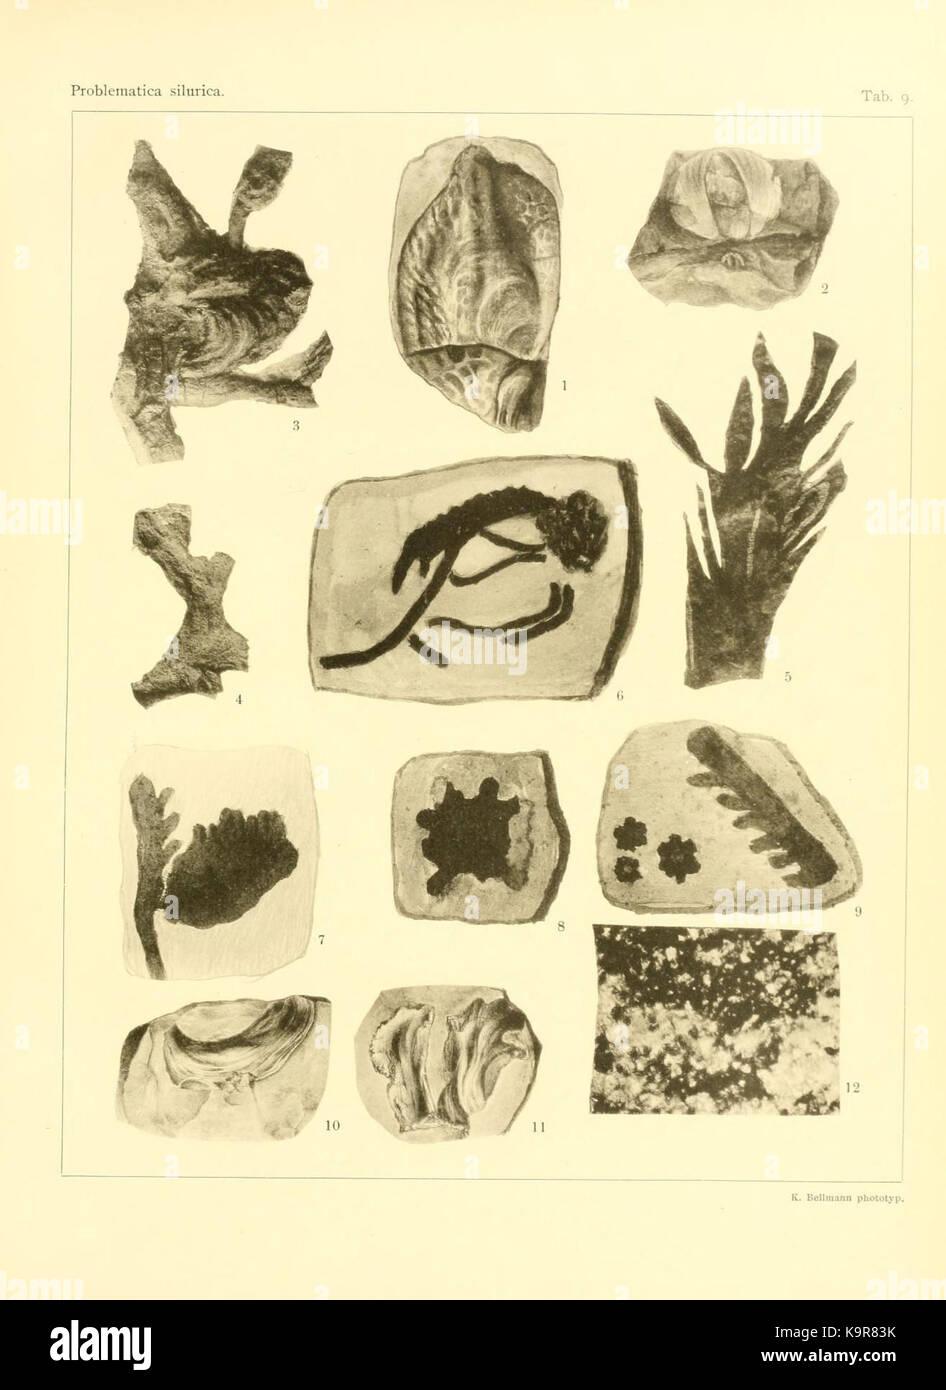 Problematica Silurica (Lámina 9) (7629250598) Foto de stock